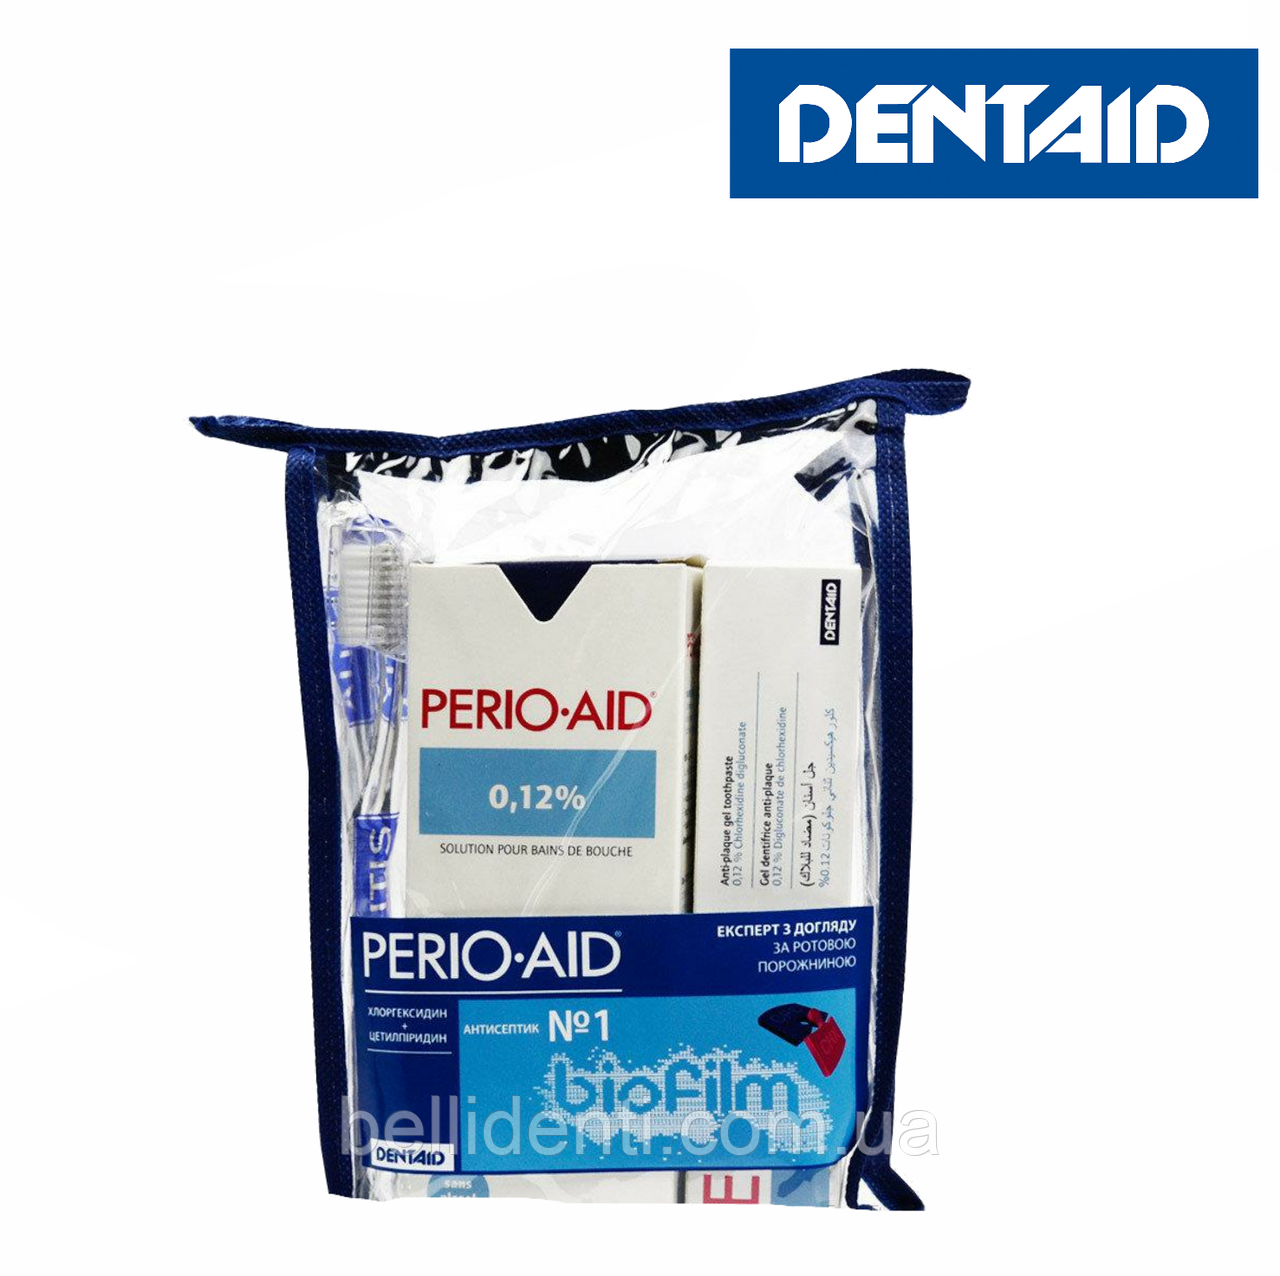 Набор PERIO-AID 0.12% (ополаскиватель 500 мл, гель-паста 75 мл,  щетка VITIS SURGICAL CAMPAIGN), косметичка